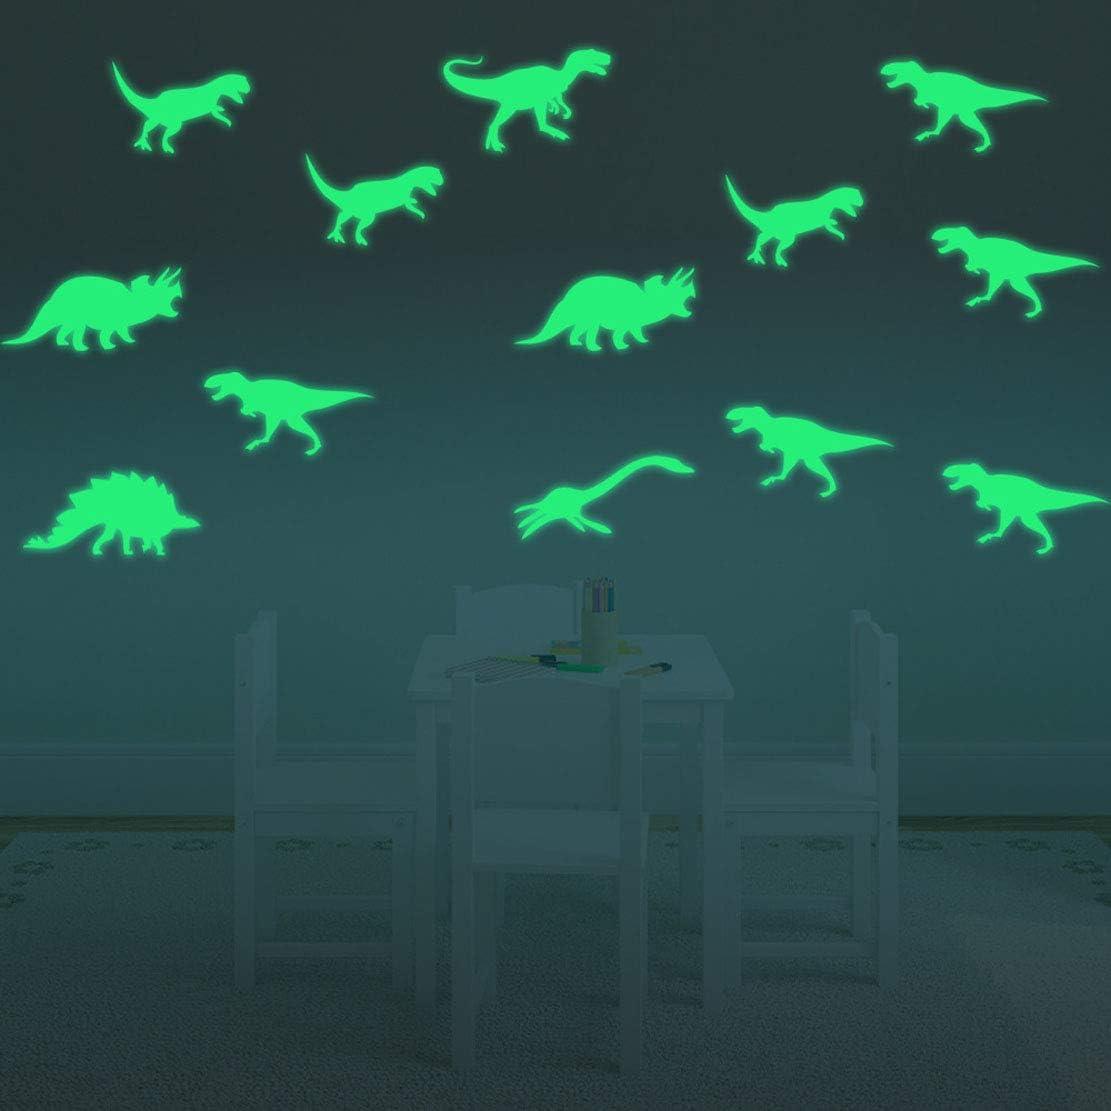 BOBOVIIA 9 Pcs Max 85% OFF 3D Glow in Dark Dinosaurs Cash special price Luminous Wall Stick The